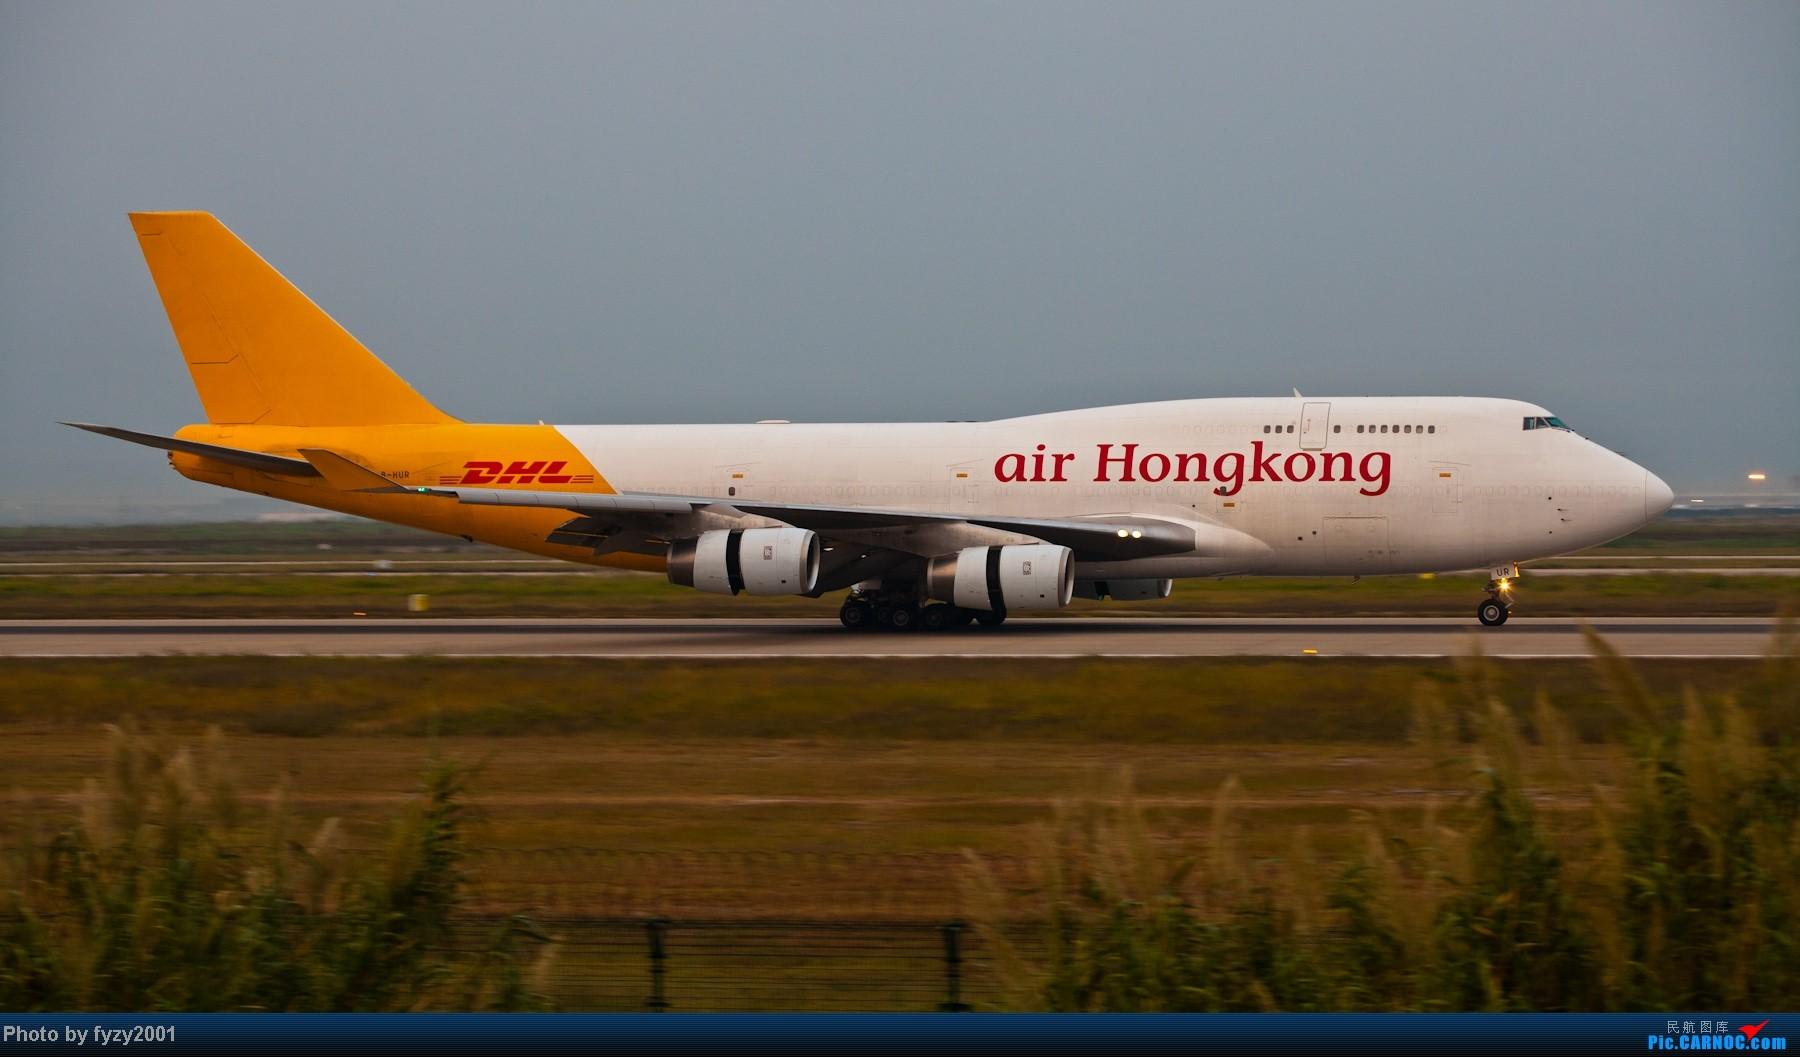 Re:[原创][无锡西站]长假PVG蹲守~~~~只发大图,多图杀猫~~~~ BOEING 747-400F B-HUR 中国上海浦东机场